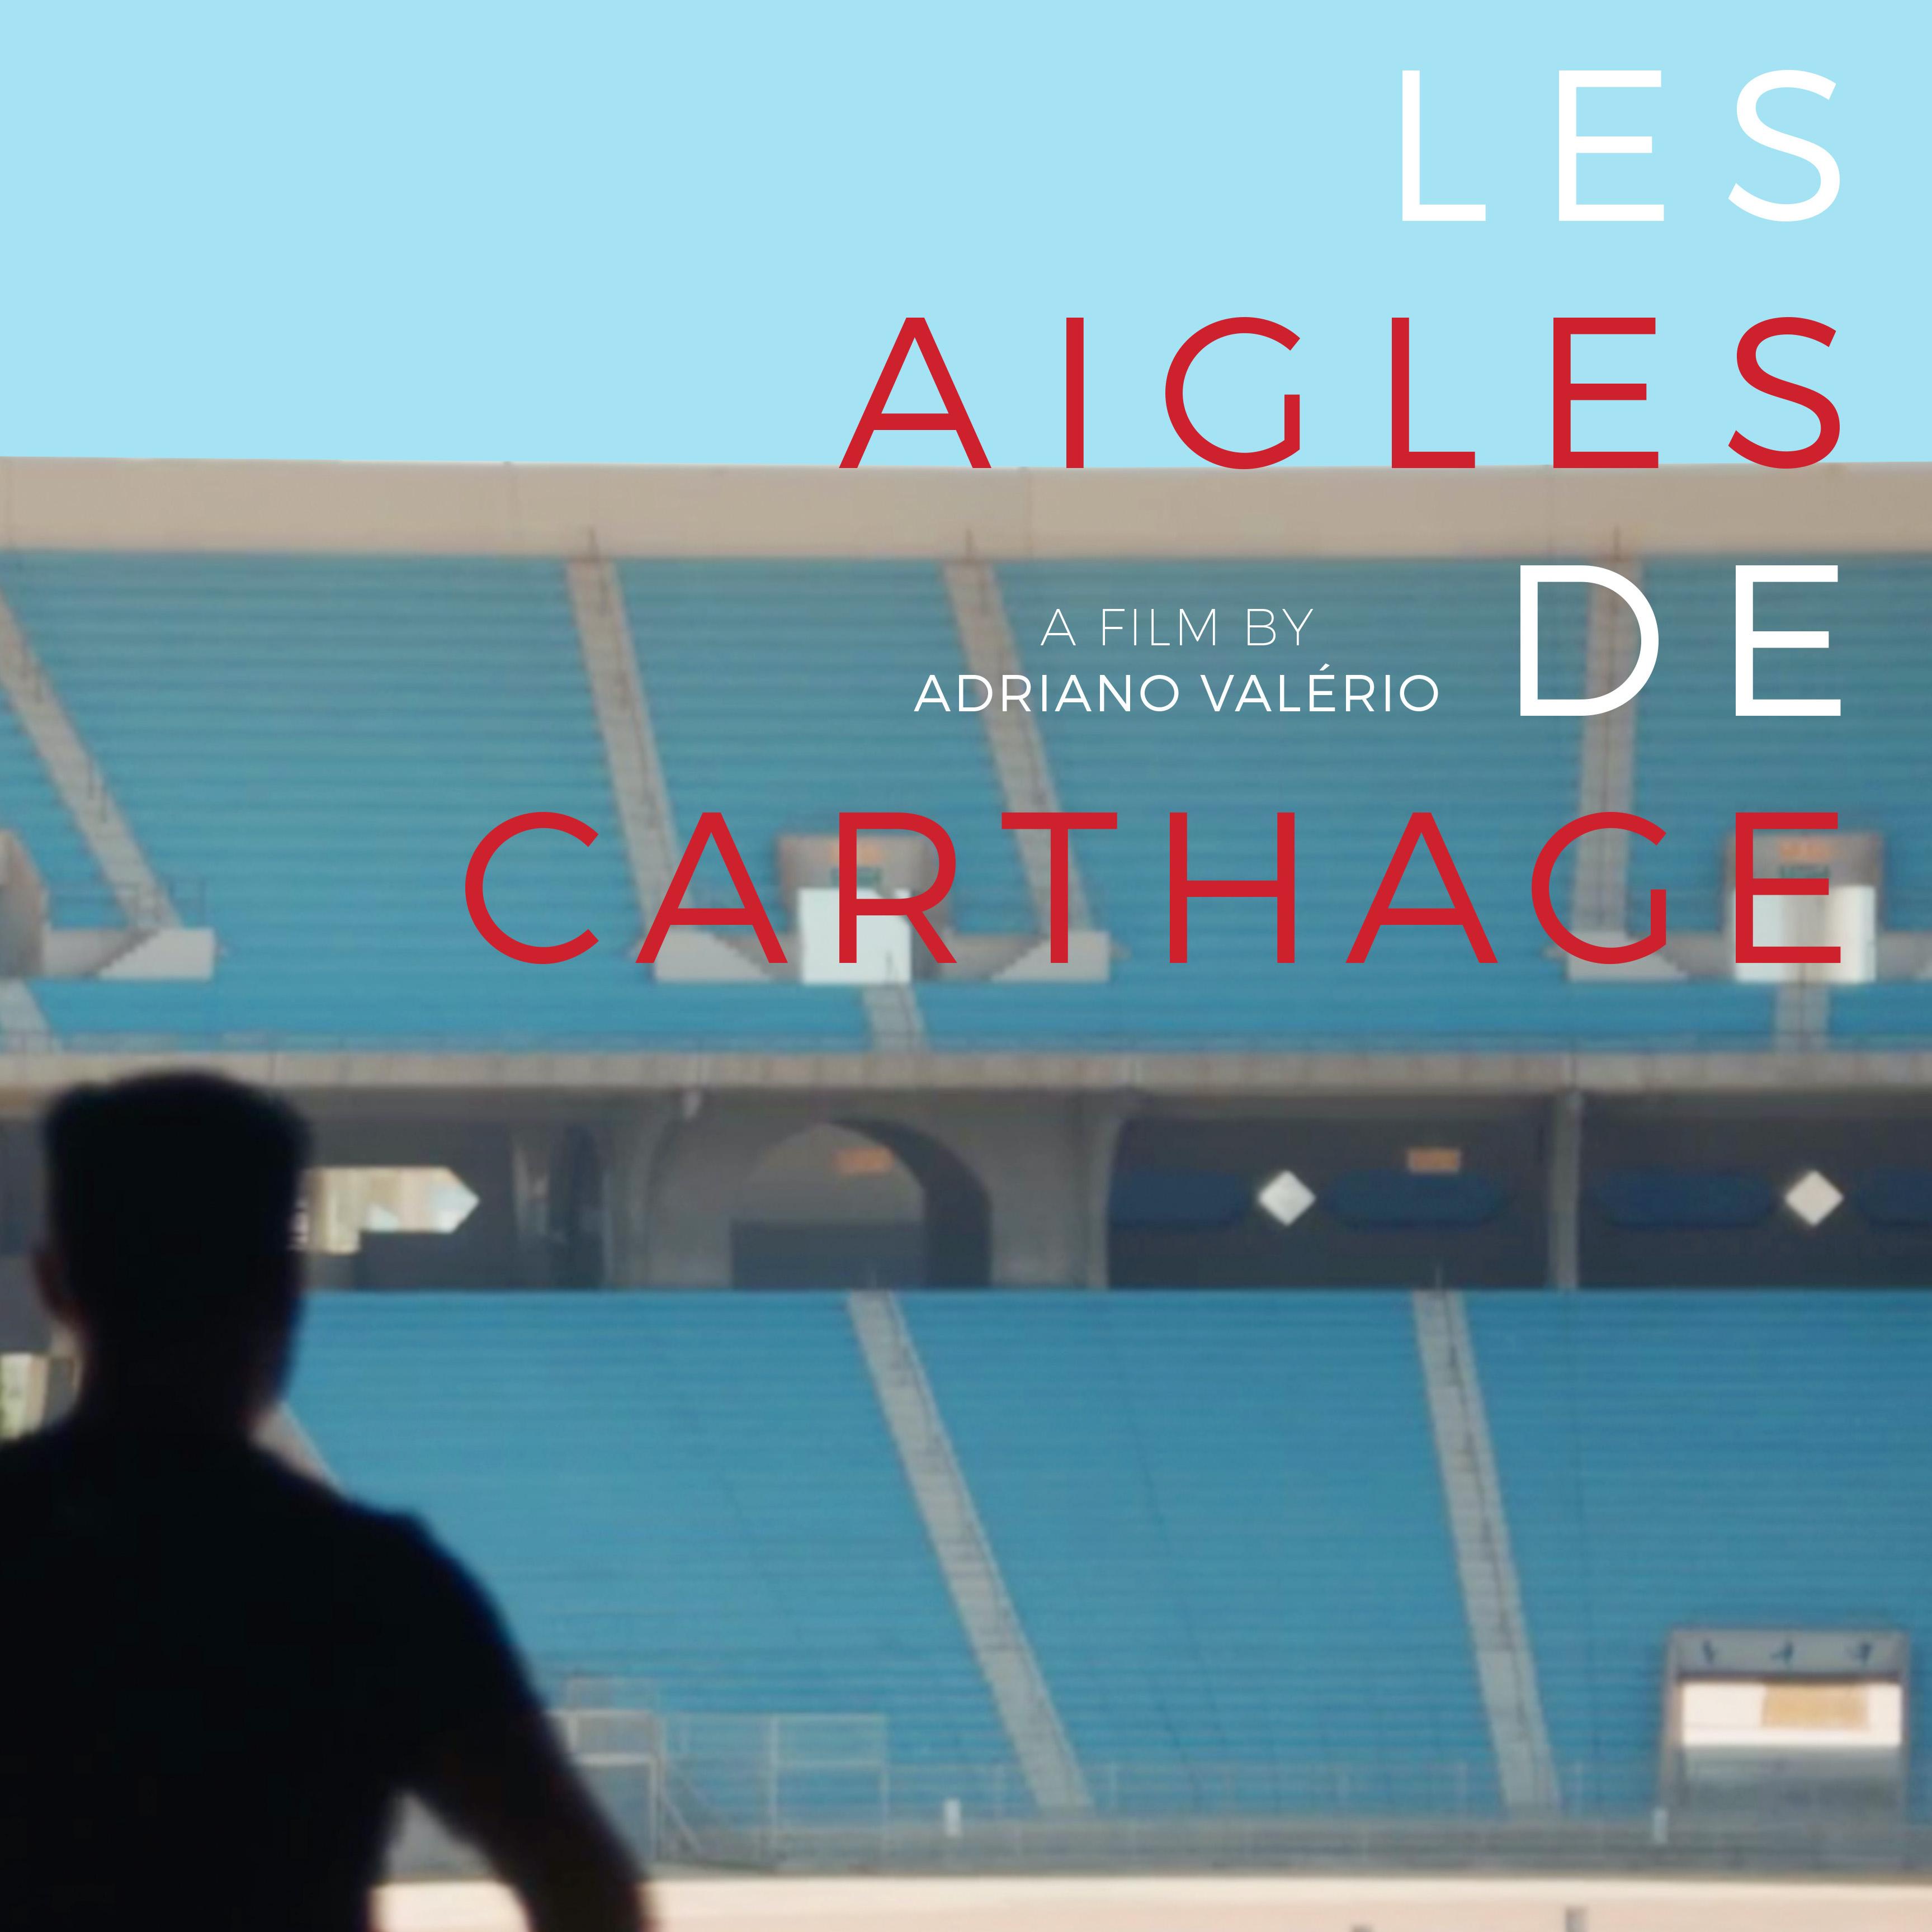 LES AIGLES DE CARTHAGE